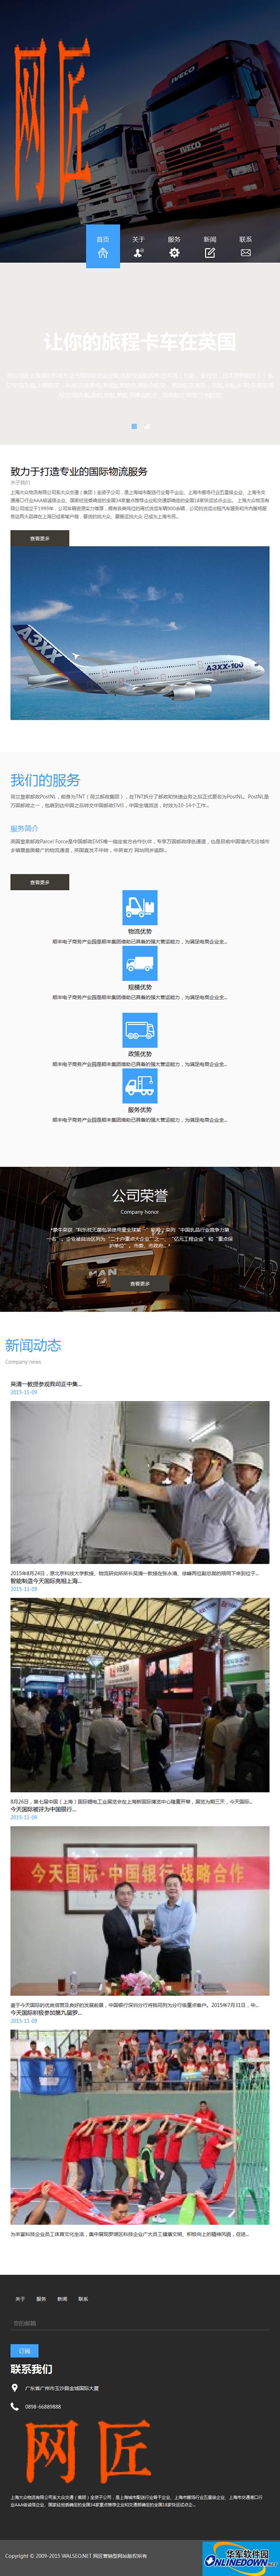 m-148HTML5自适应响应式国际货运物流公司网站织梦模板